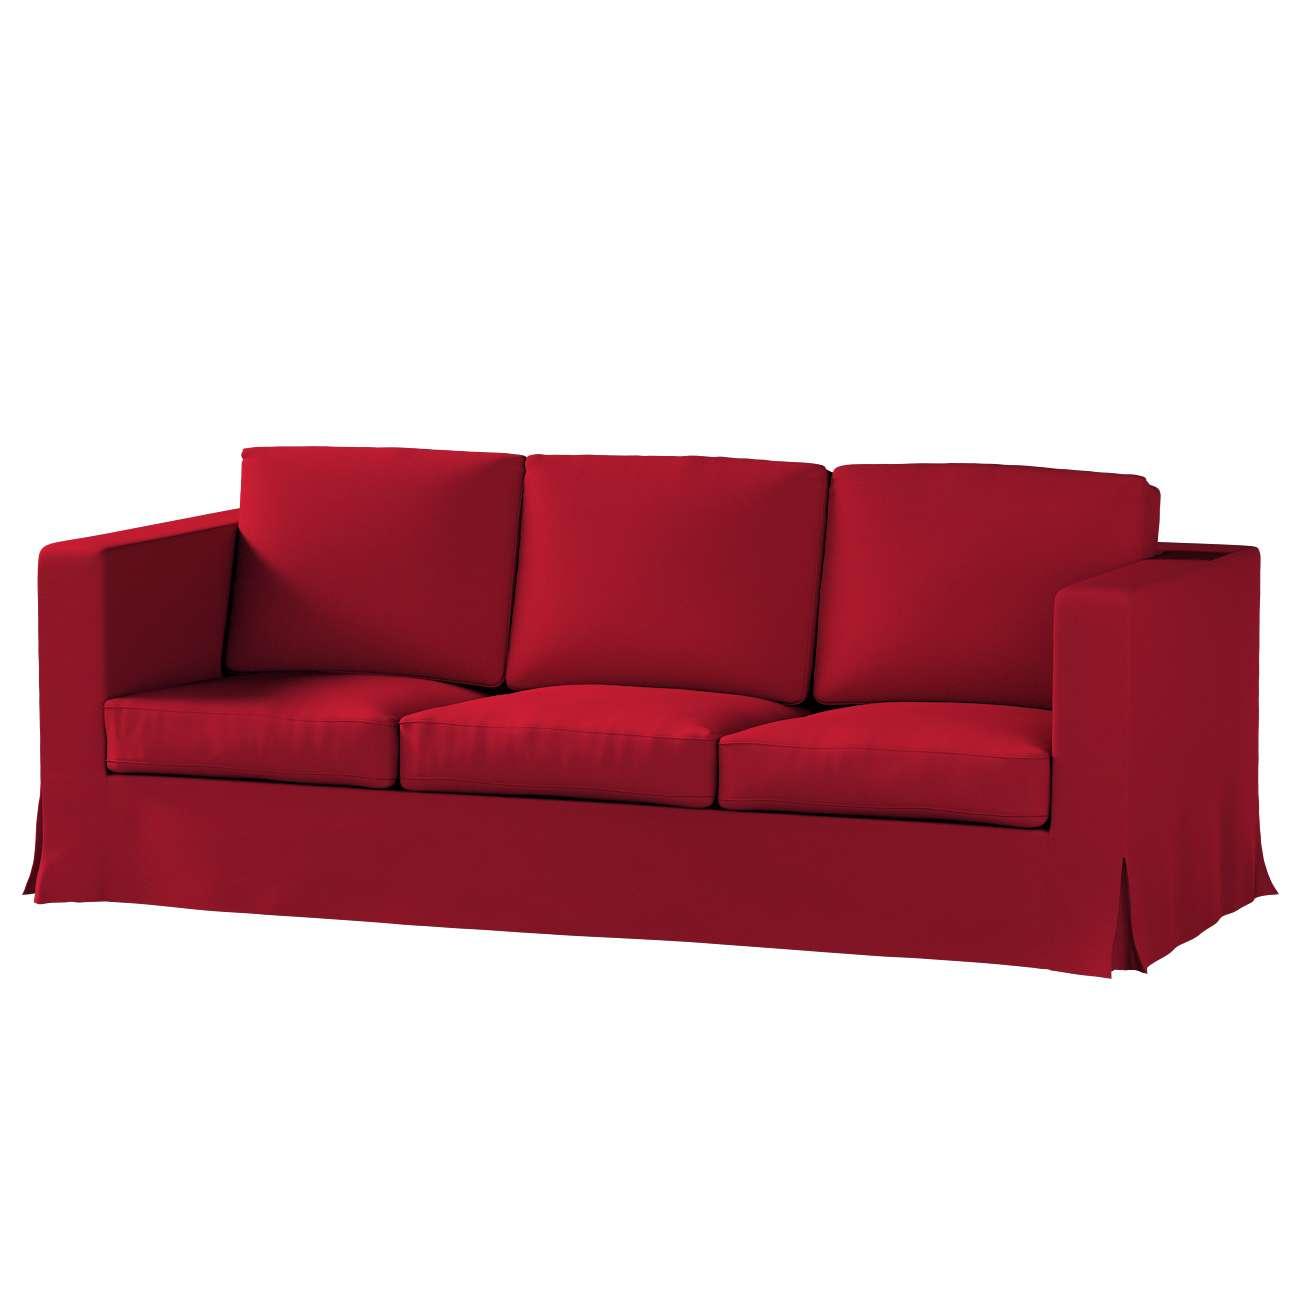 Karlanda 3-Sitzer  Sofabezug nicht ausklappbar lang Sofa Karlanda 3-lang von der Kollektion Etna, Stoff: 705-60